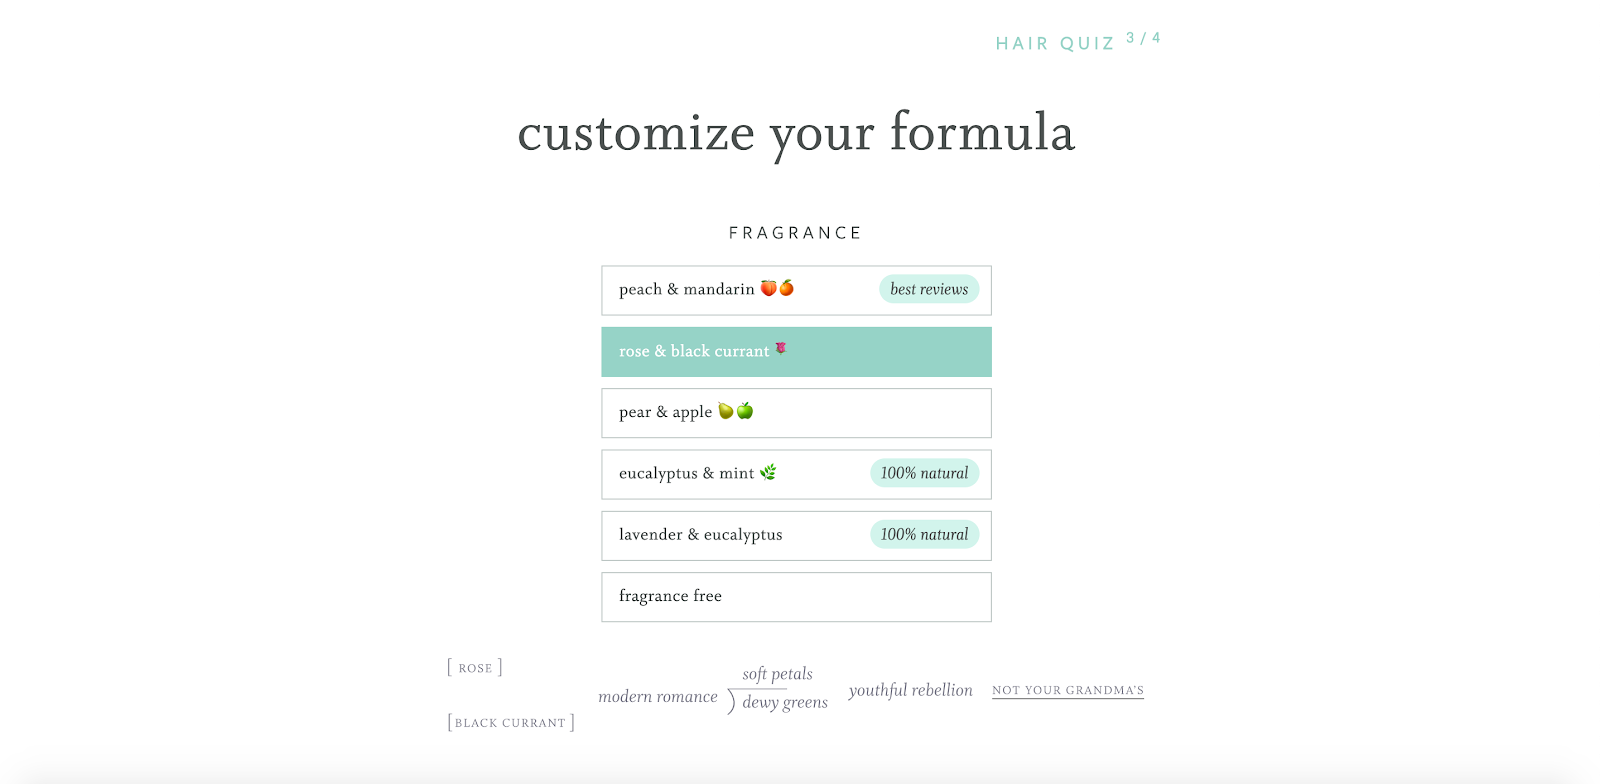 shampoo customized formula